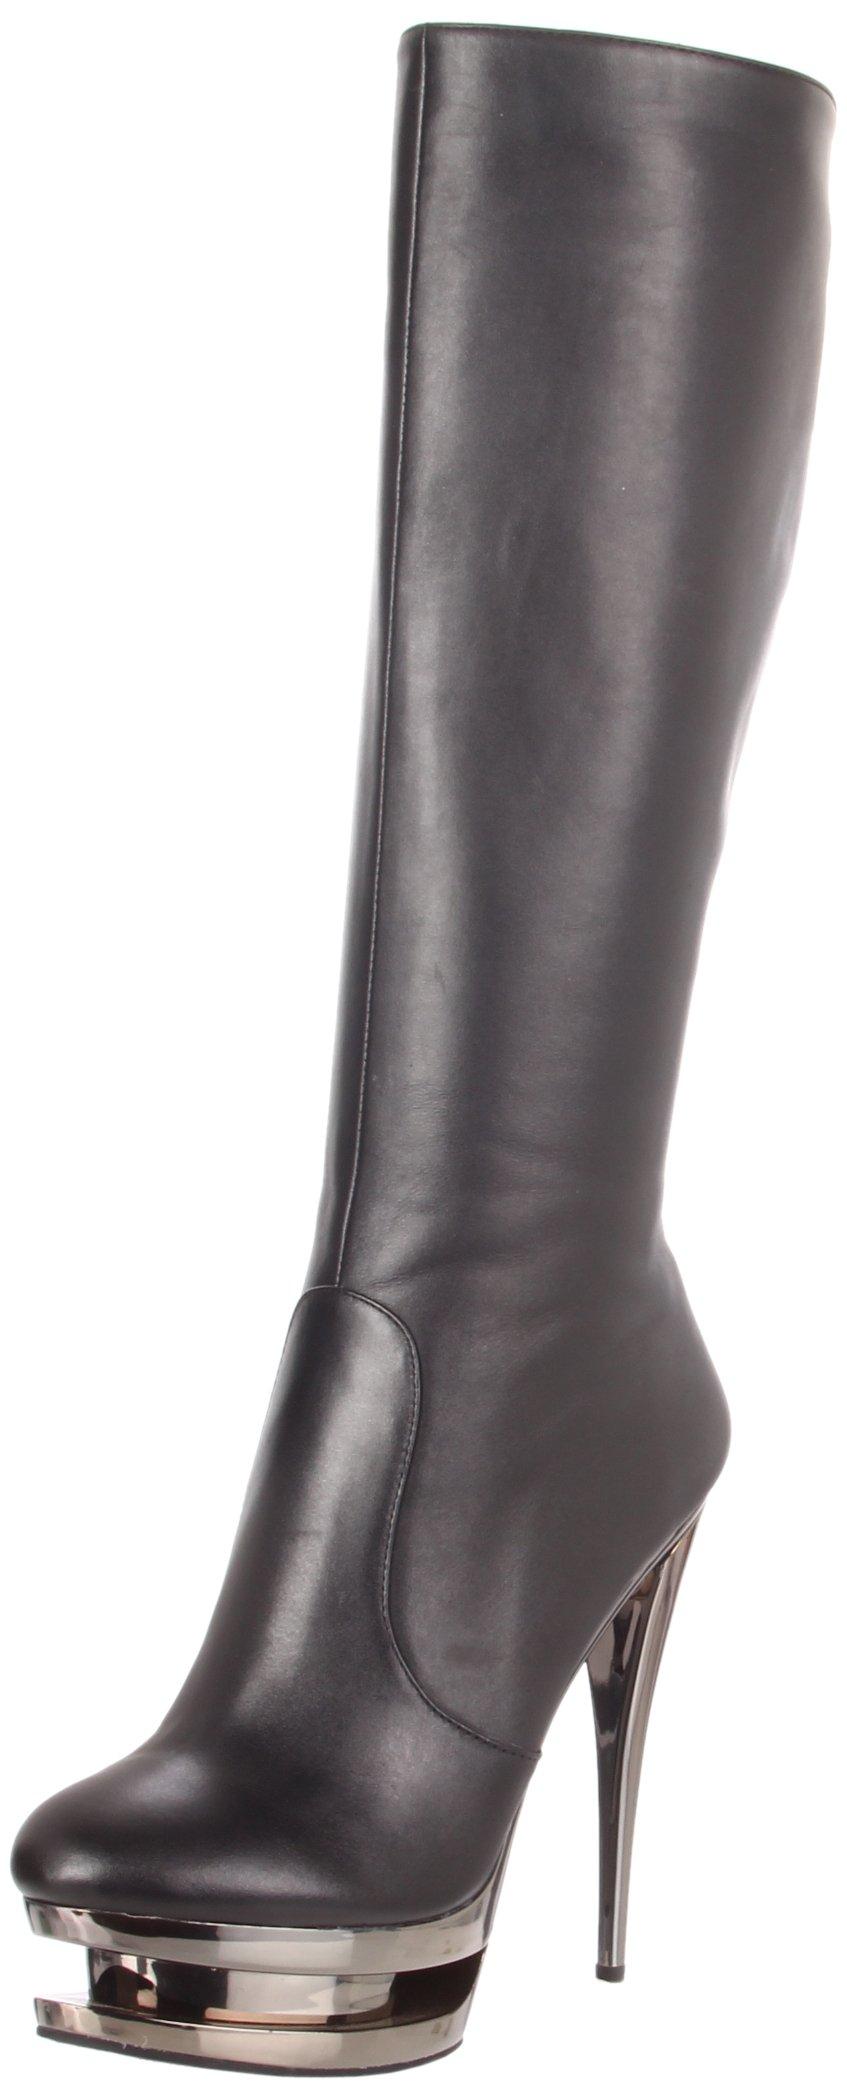 Pleaser Women's Fascinate-2010/BLE/PCH Platform Sandal,Black Leather/Pewter Chrome,5 M US